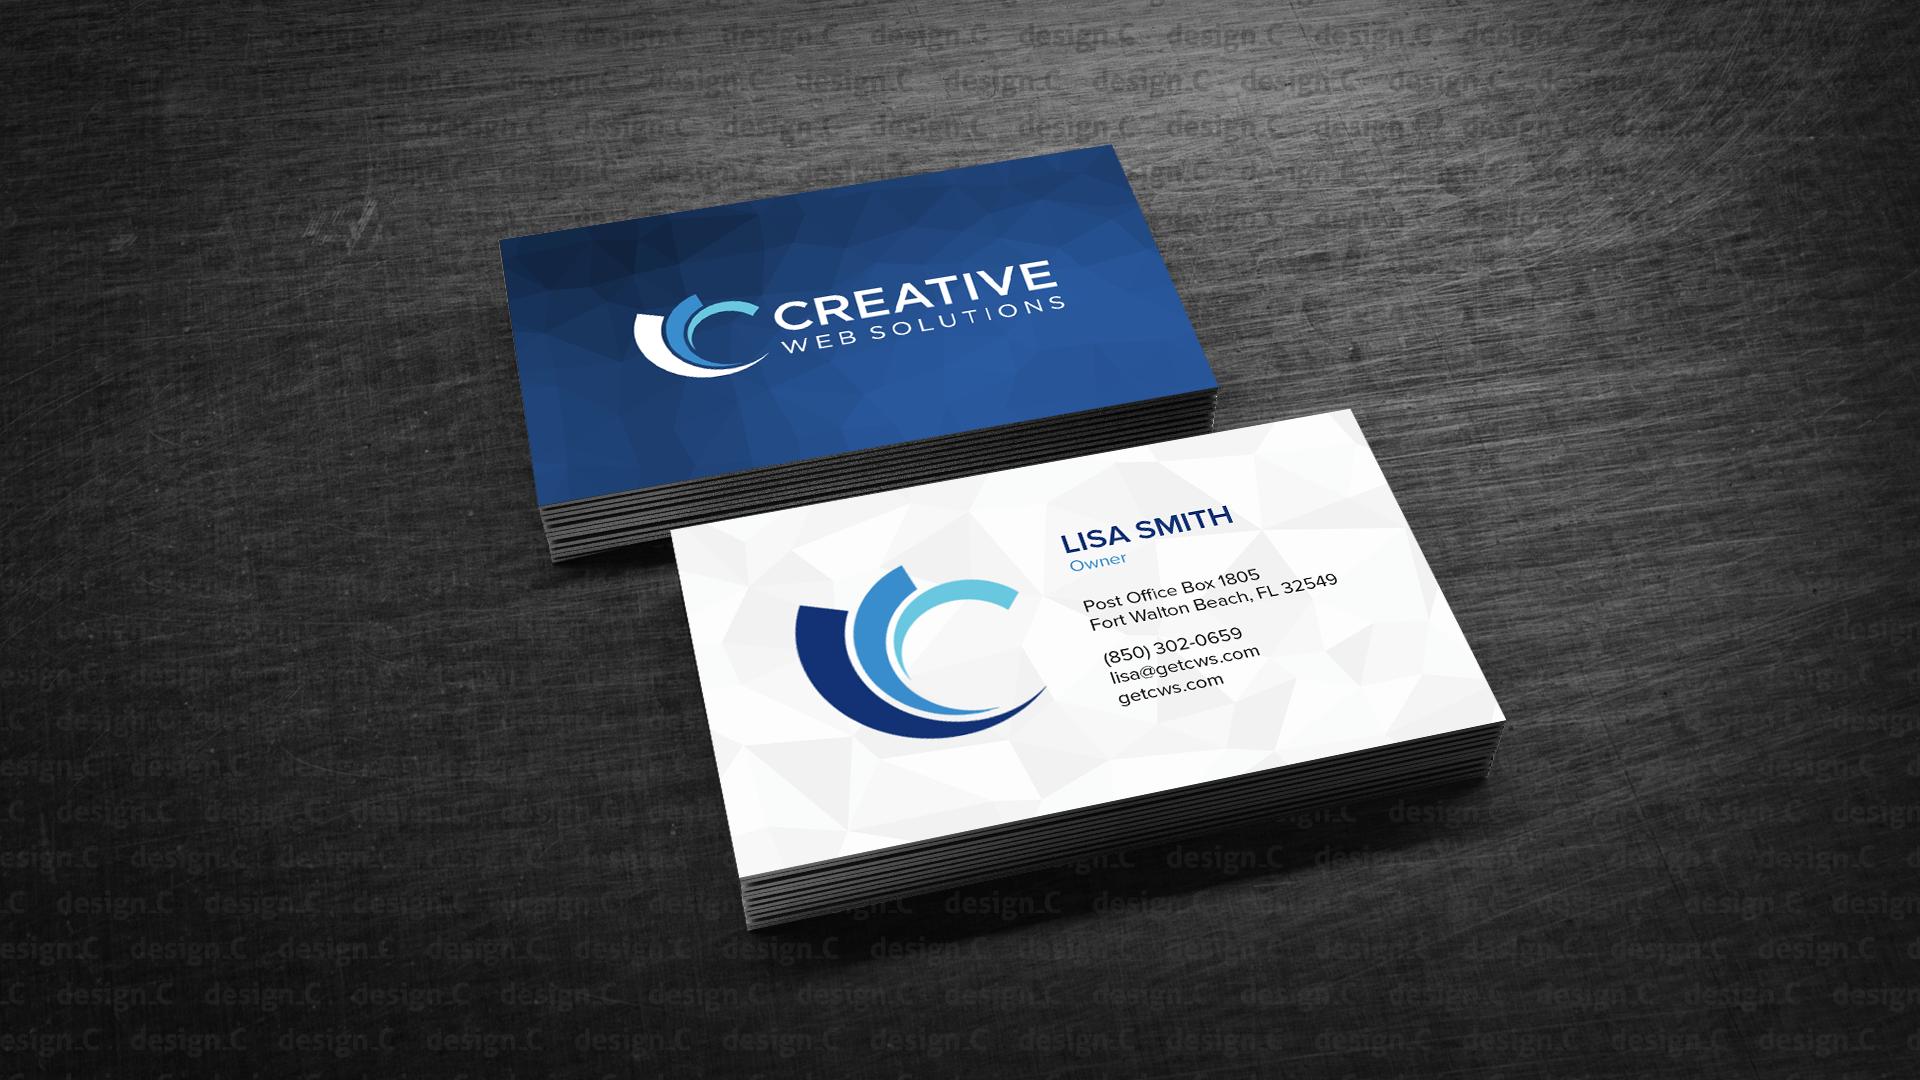 Https Www Fiverr Com Pixel Lab Design Professional Business Card For You Graphic Design Business Card Business Card Design Clever Business Cards